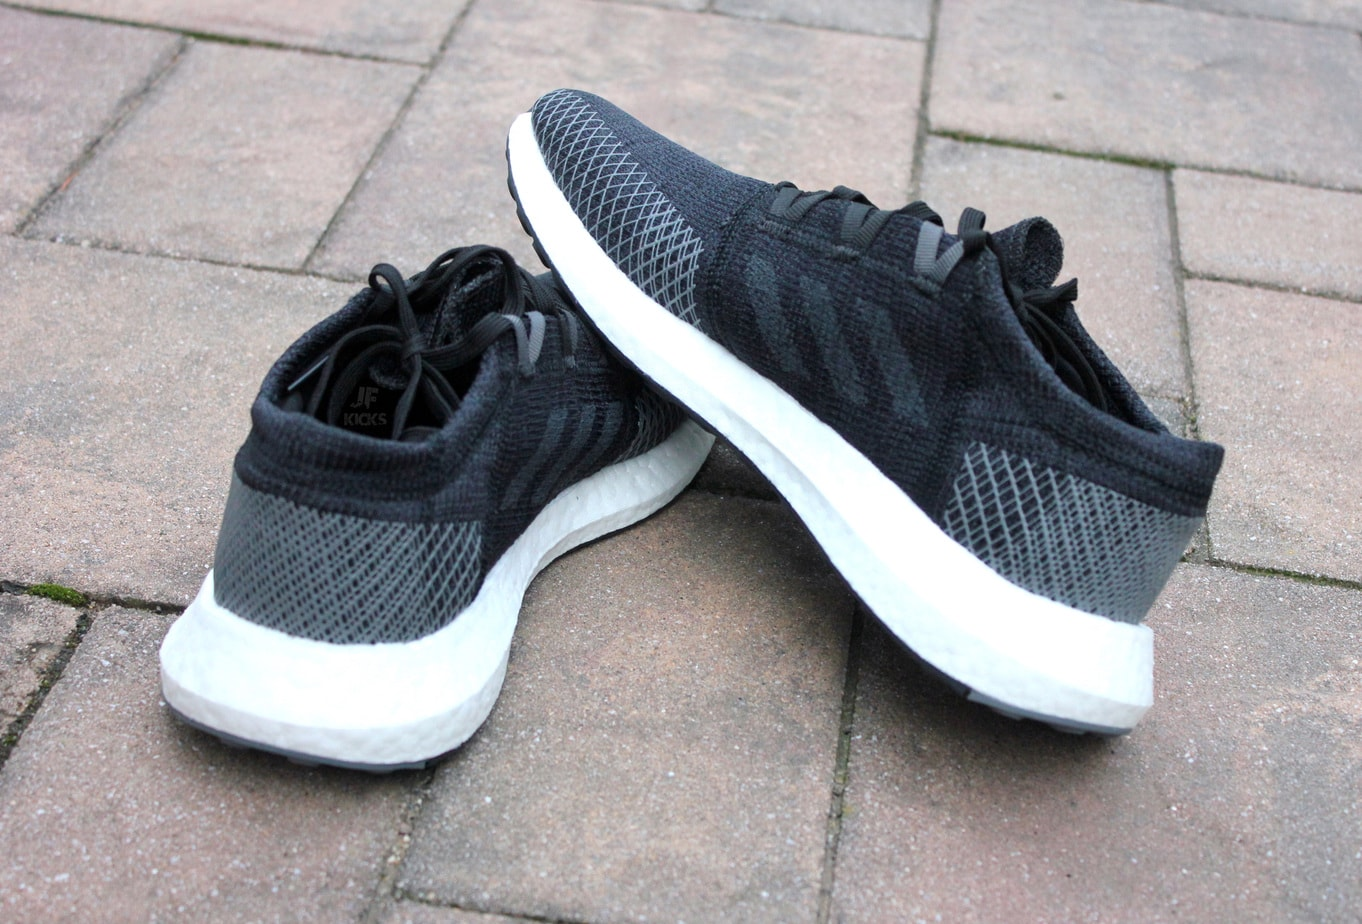 Adidas Pureboost Go On Foot Review Air Jordan Release Dates